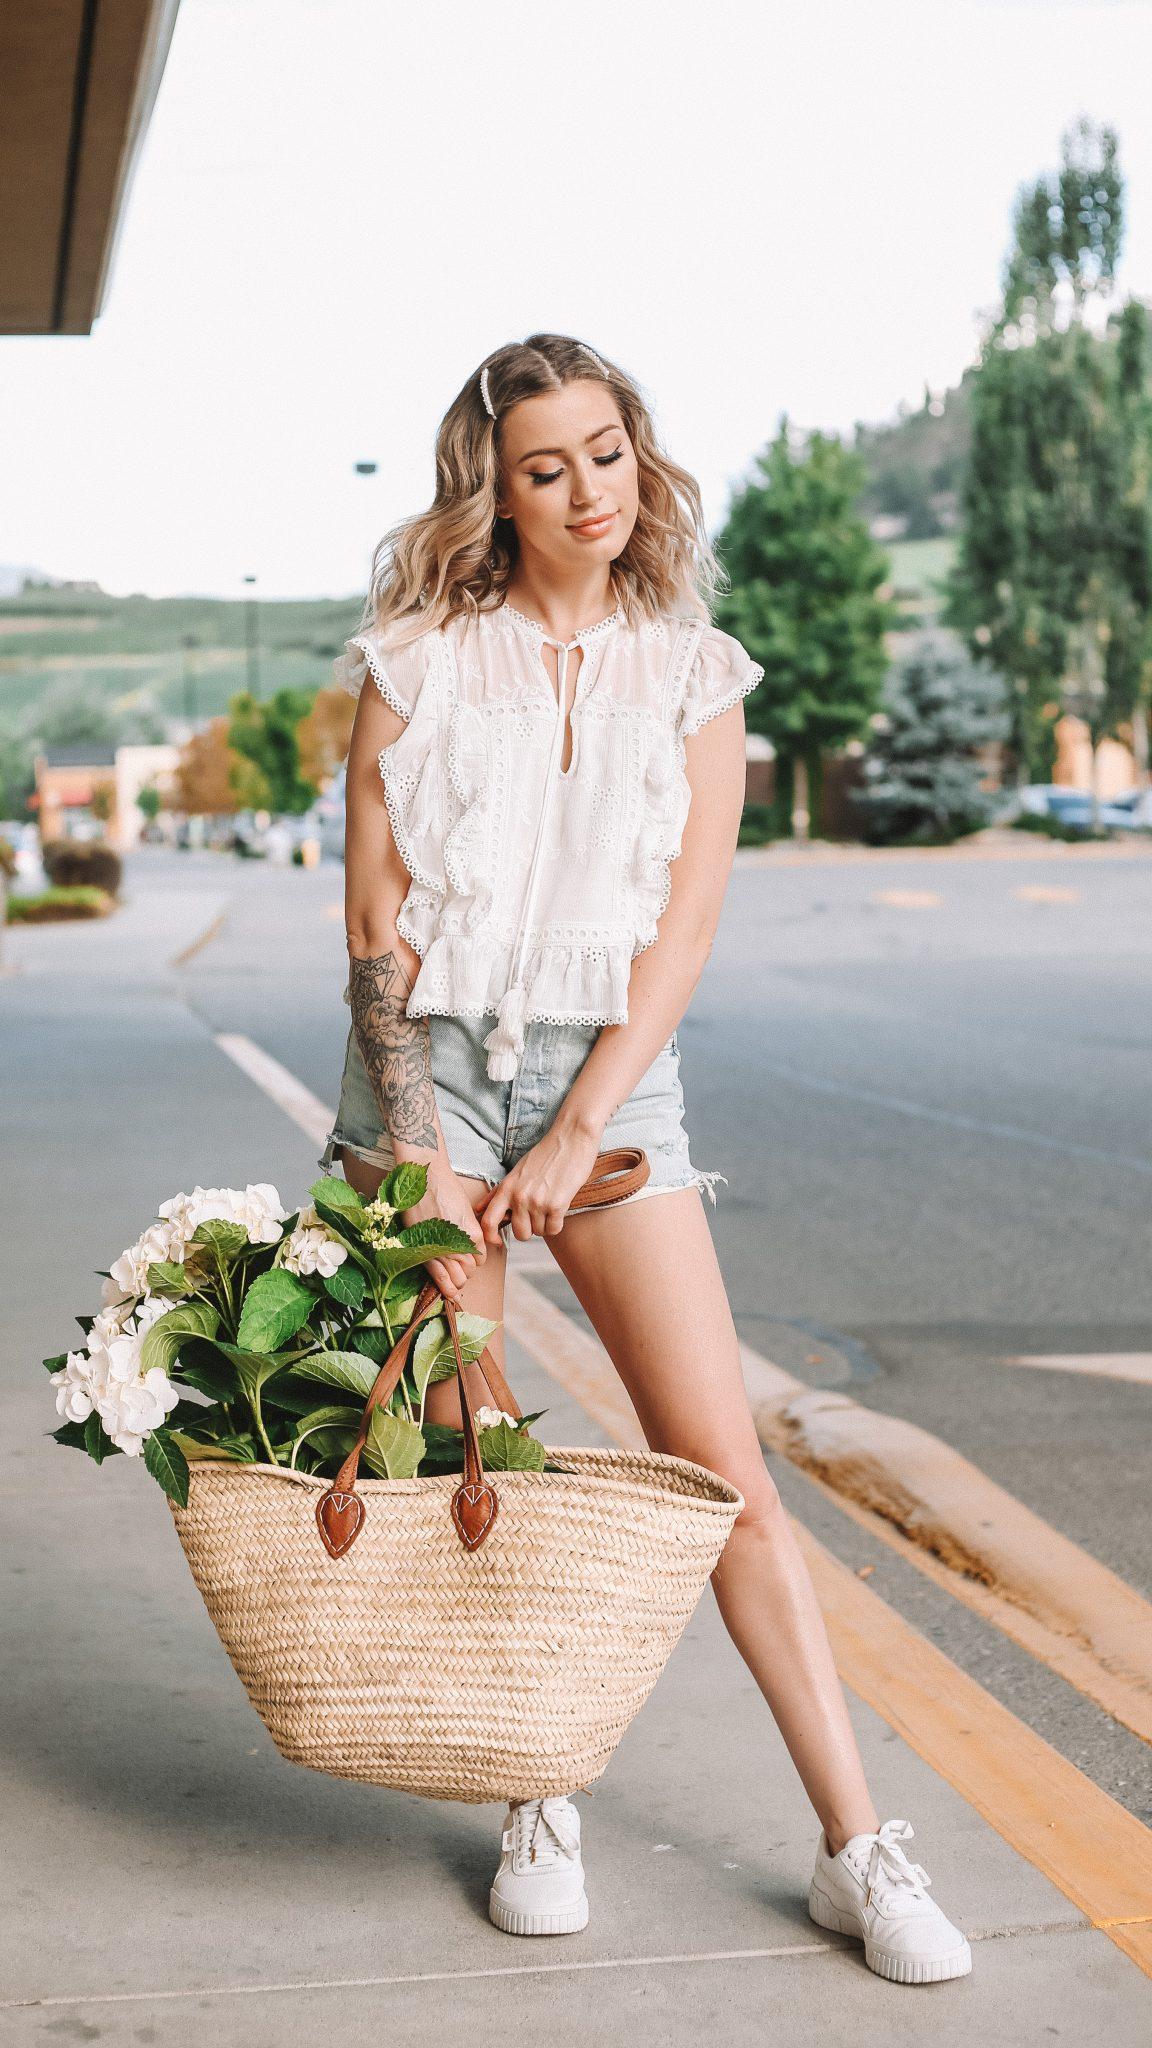 Karissa Pukas with a straw market basket- eco friendly shopping